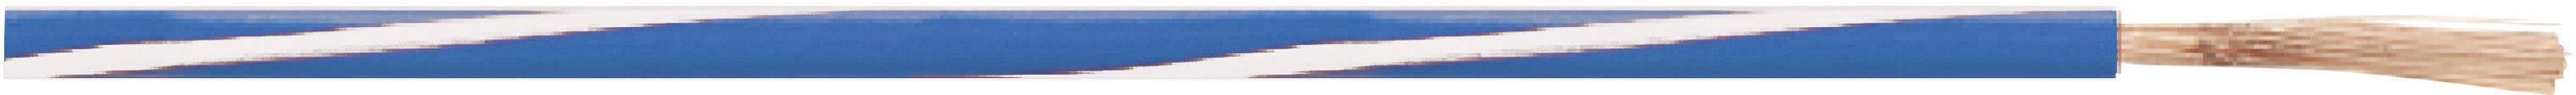 Opletenie / lanko LappKabel 4512432S X05V-K, 1 x 0.75 mm², vonkajší Ø 2.40 mm, metrový tovar, biela, čierna